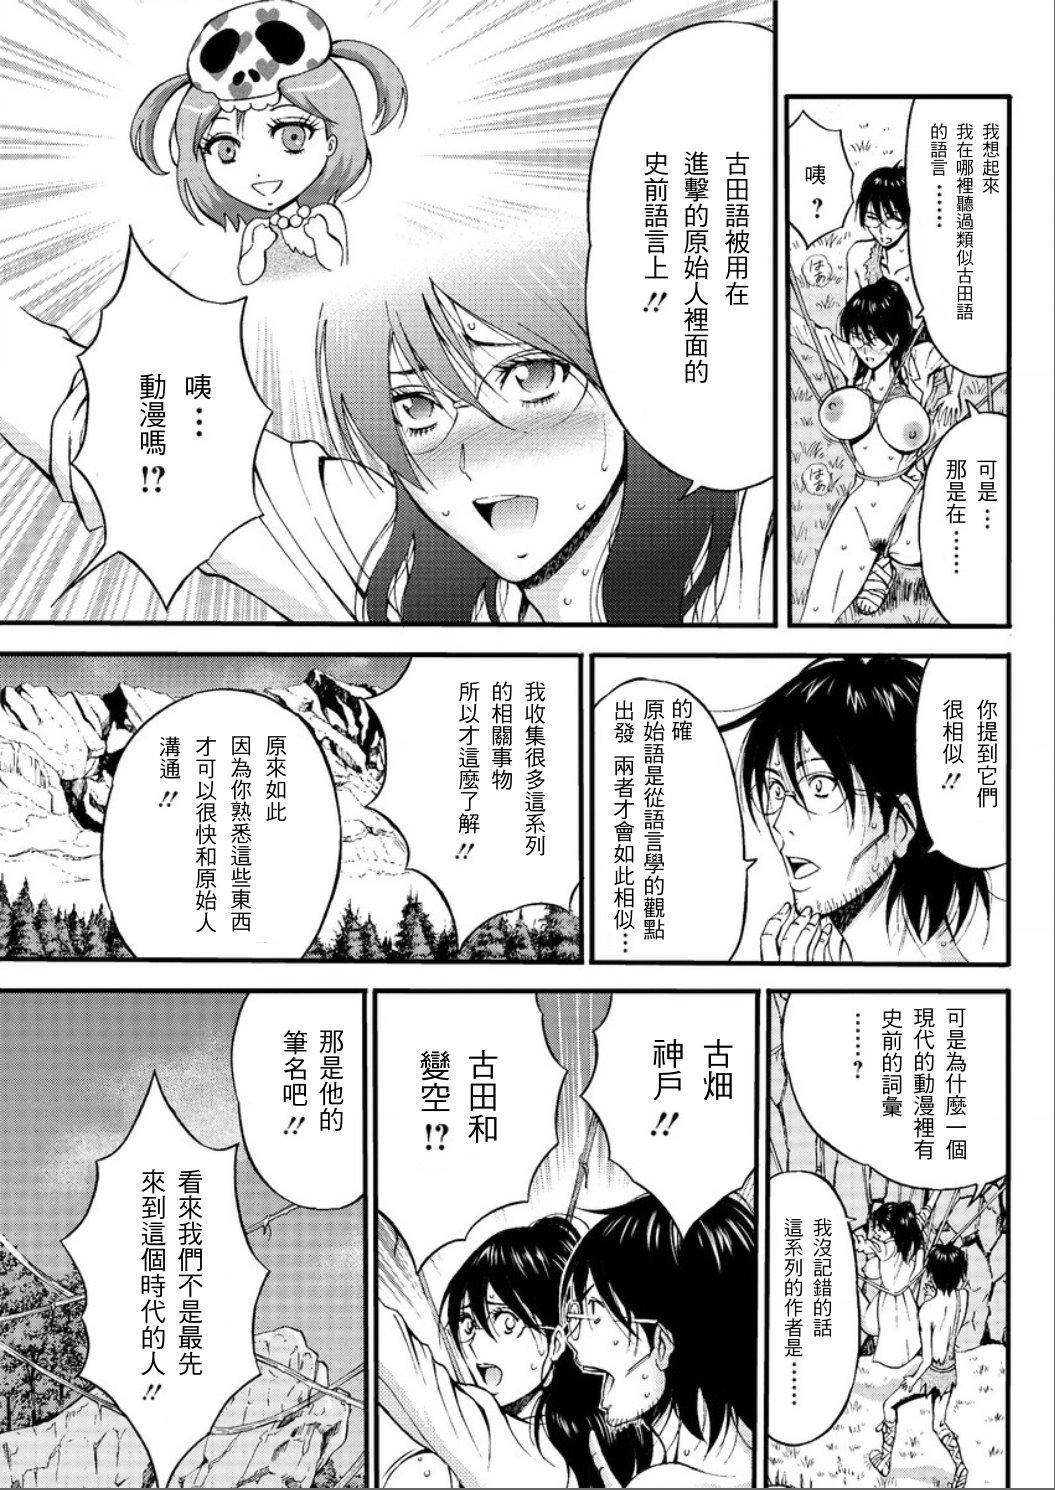 Kigenzen 10000 Nen no Ota | 史前一萬年的宅男 Ch. 19-24 16